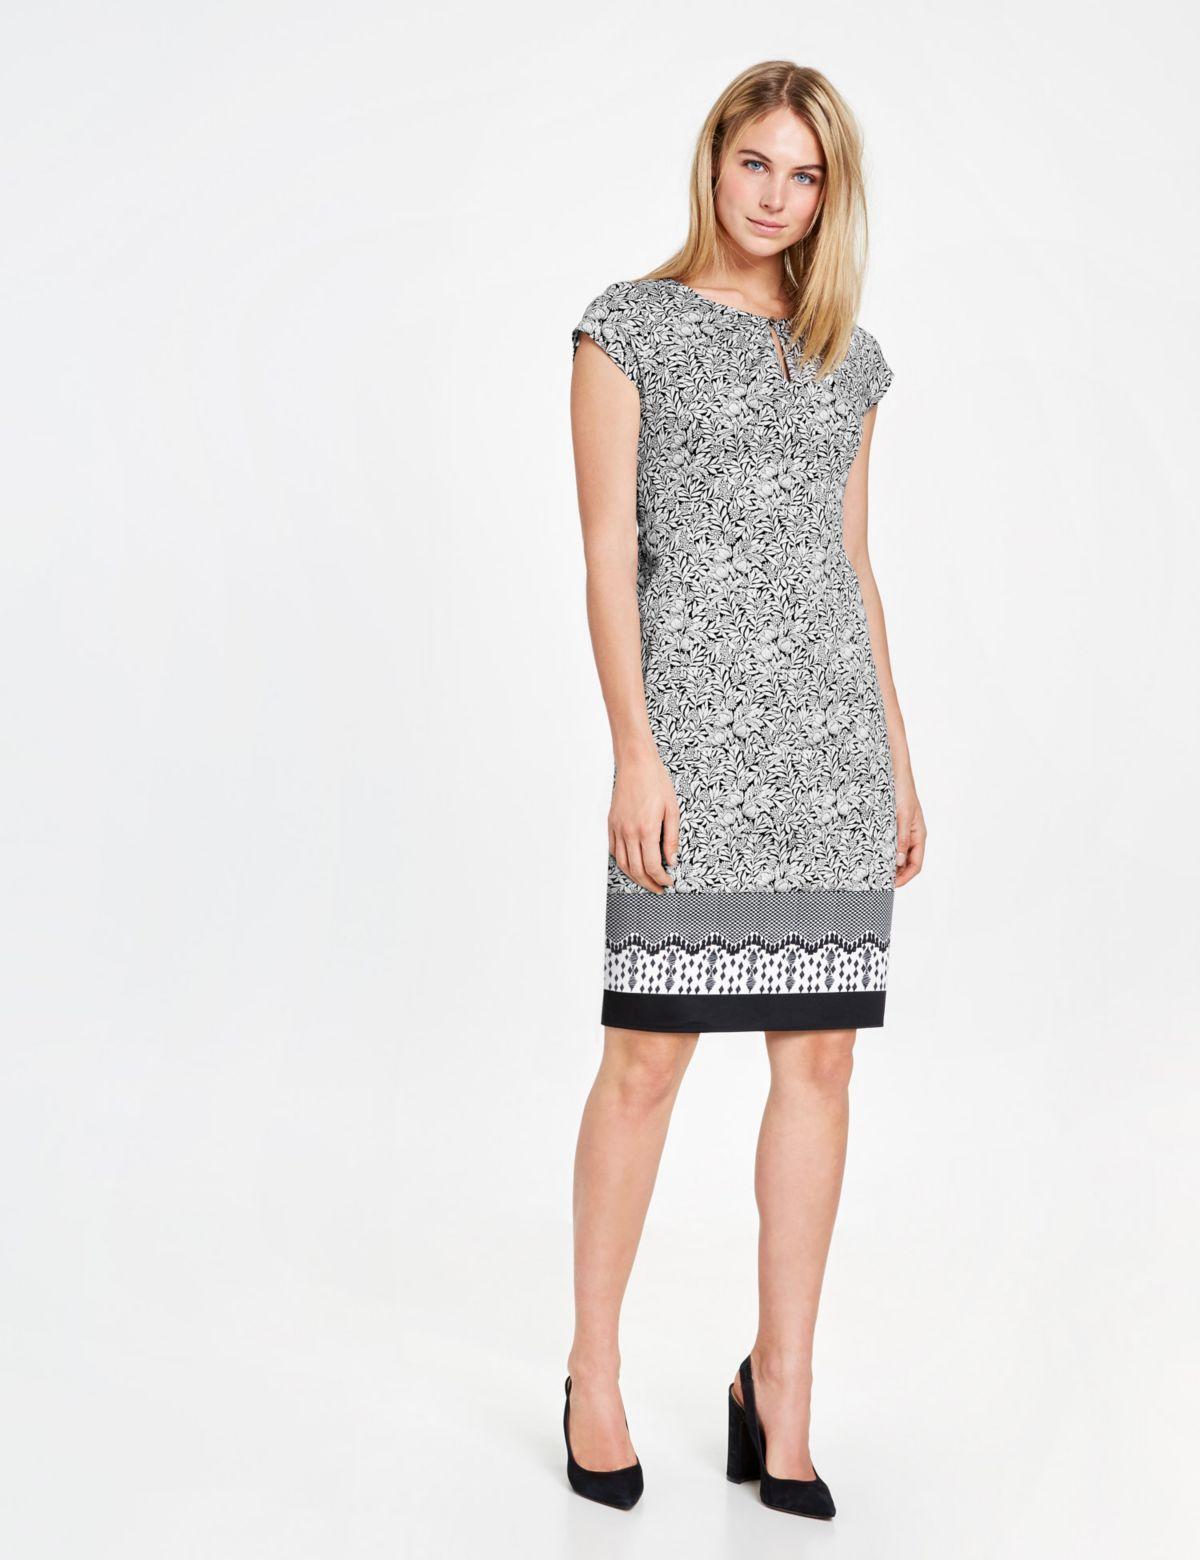 Taifun Kurz »etuikleid Print«Kleider Mit Allover Langarm Kleid F3TK1lcJ